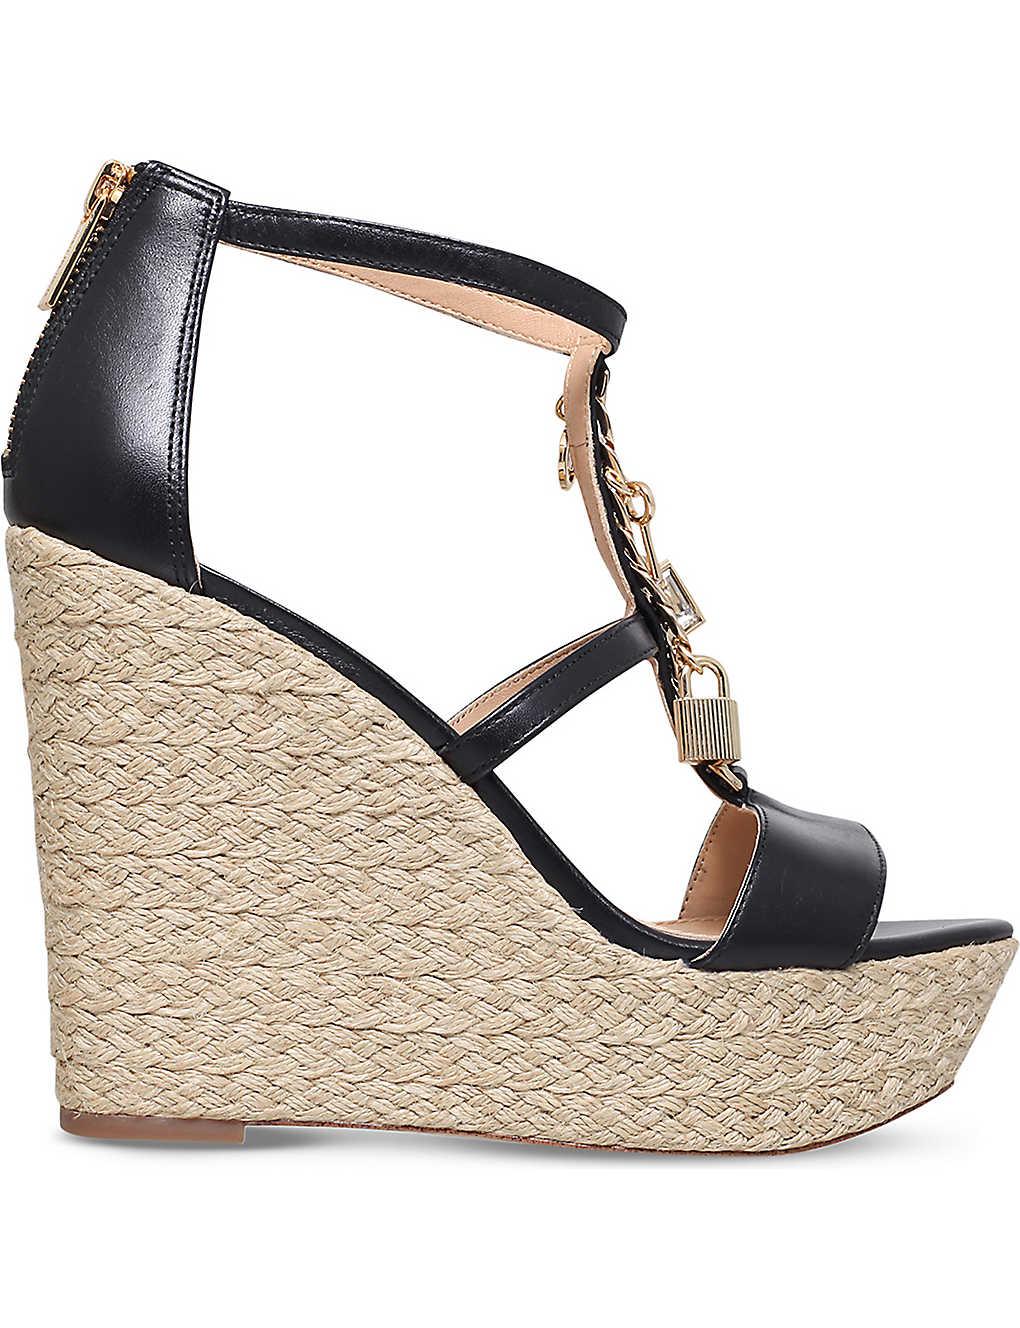 028fe786726e6 MICHAEL MICHAEL KORS - Suki leather platform sandals